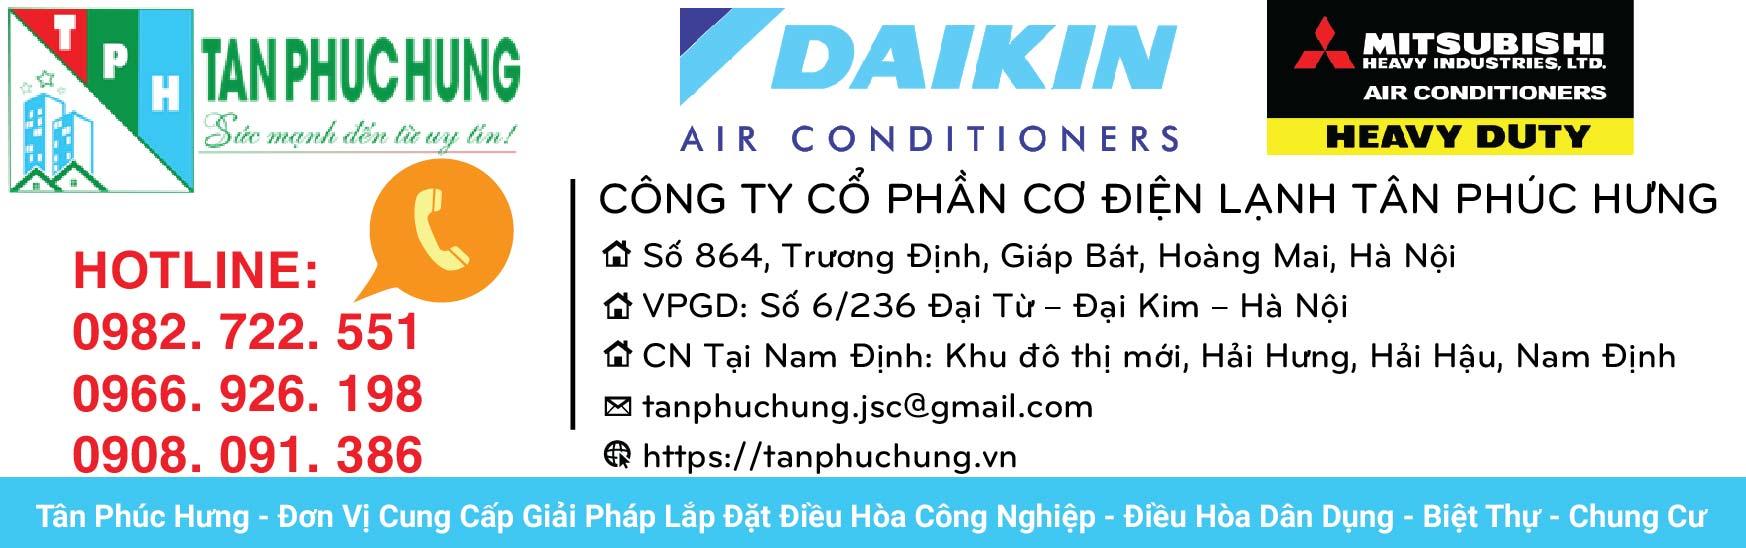 Cong Ty Co Phan Co Dien Lanh Tan Phuc Hung